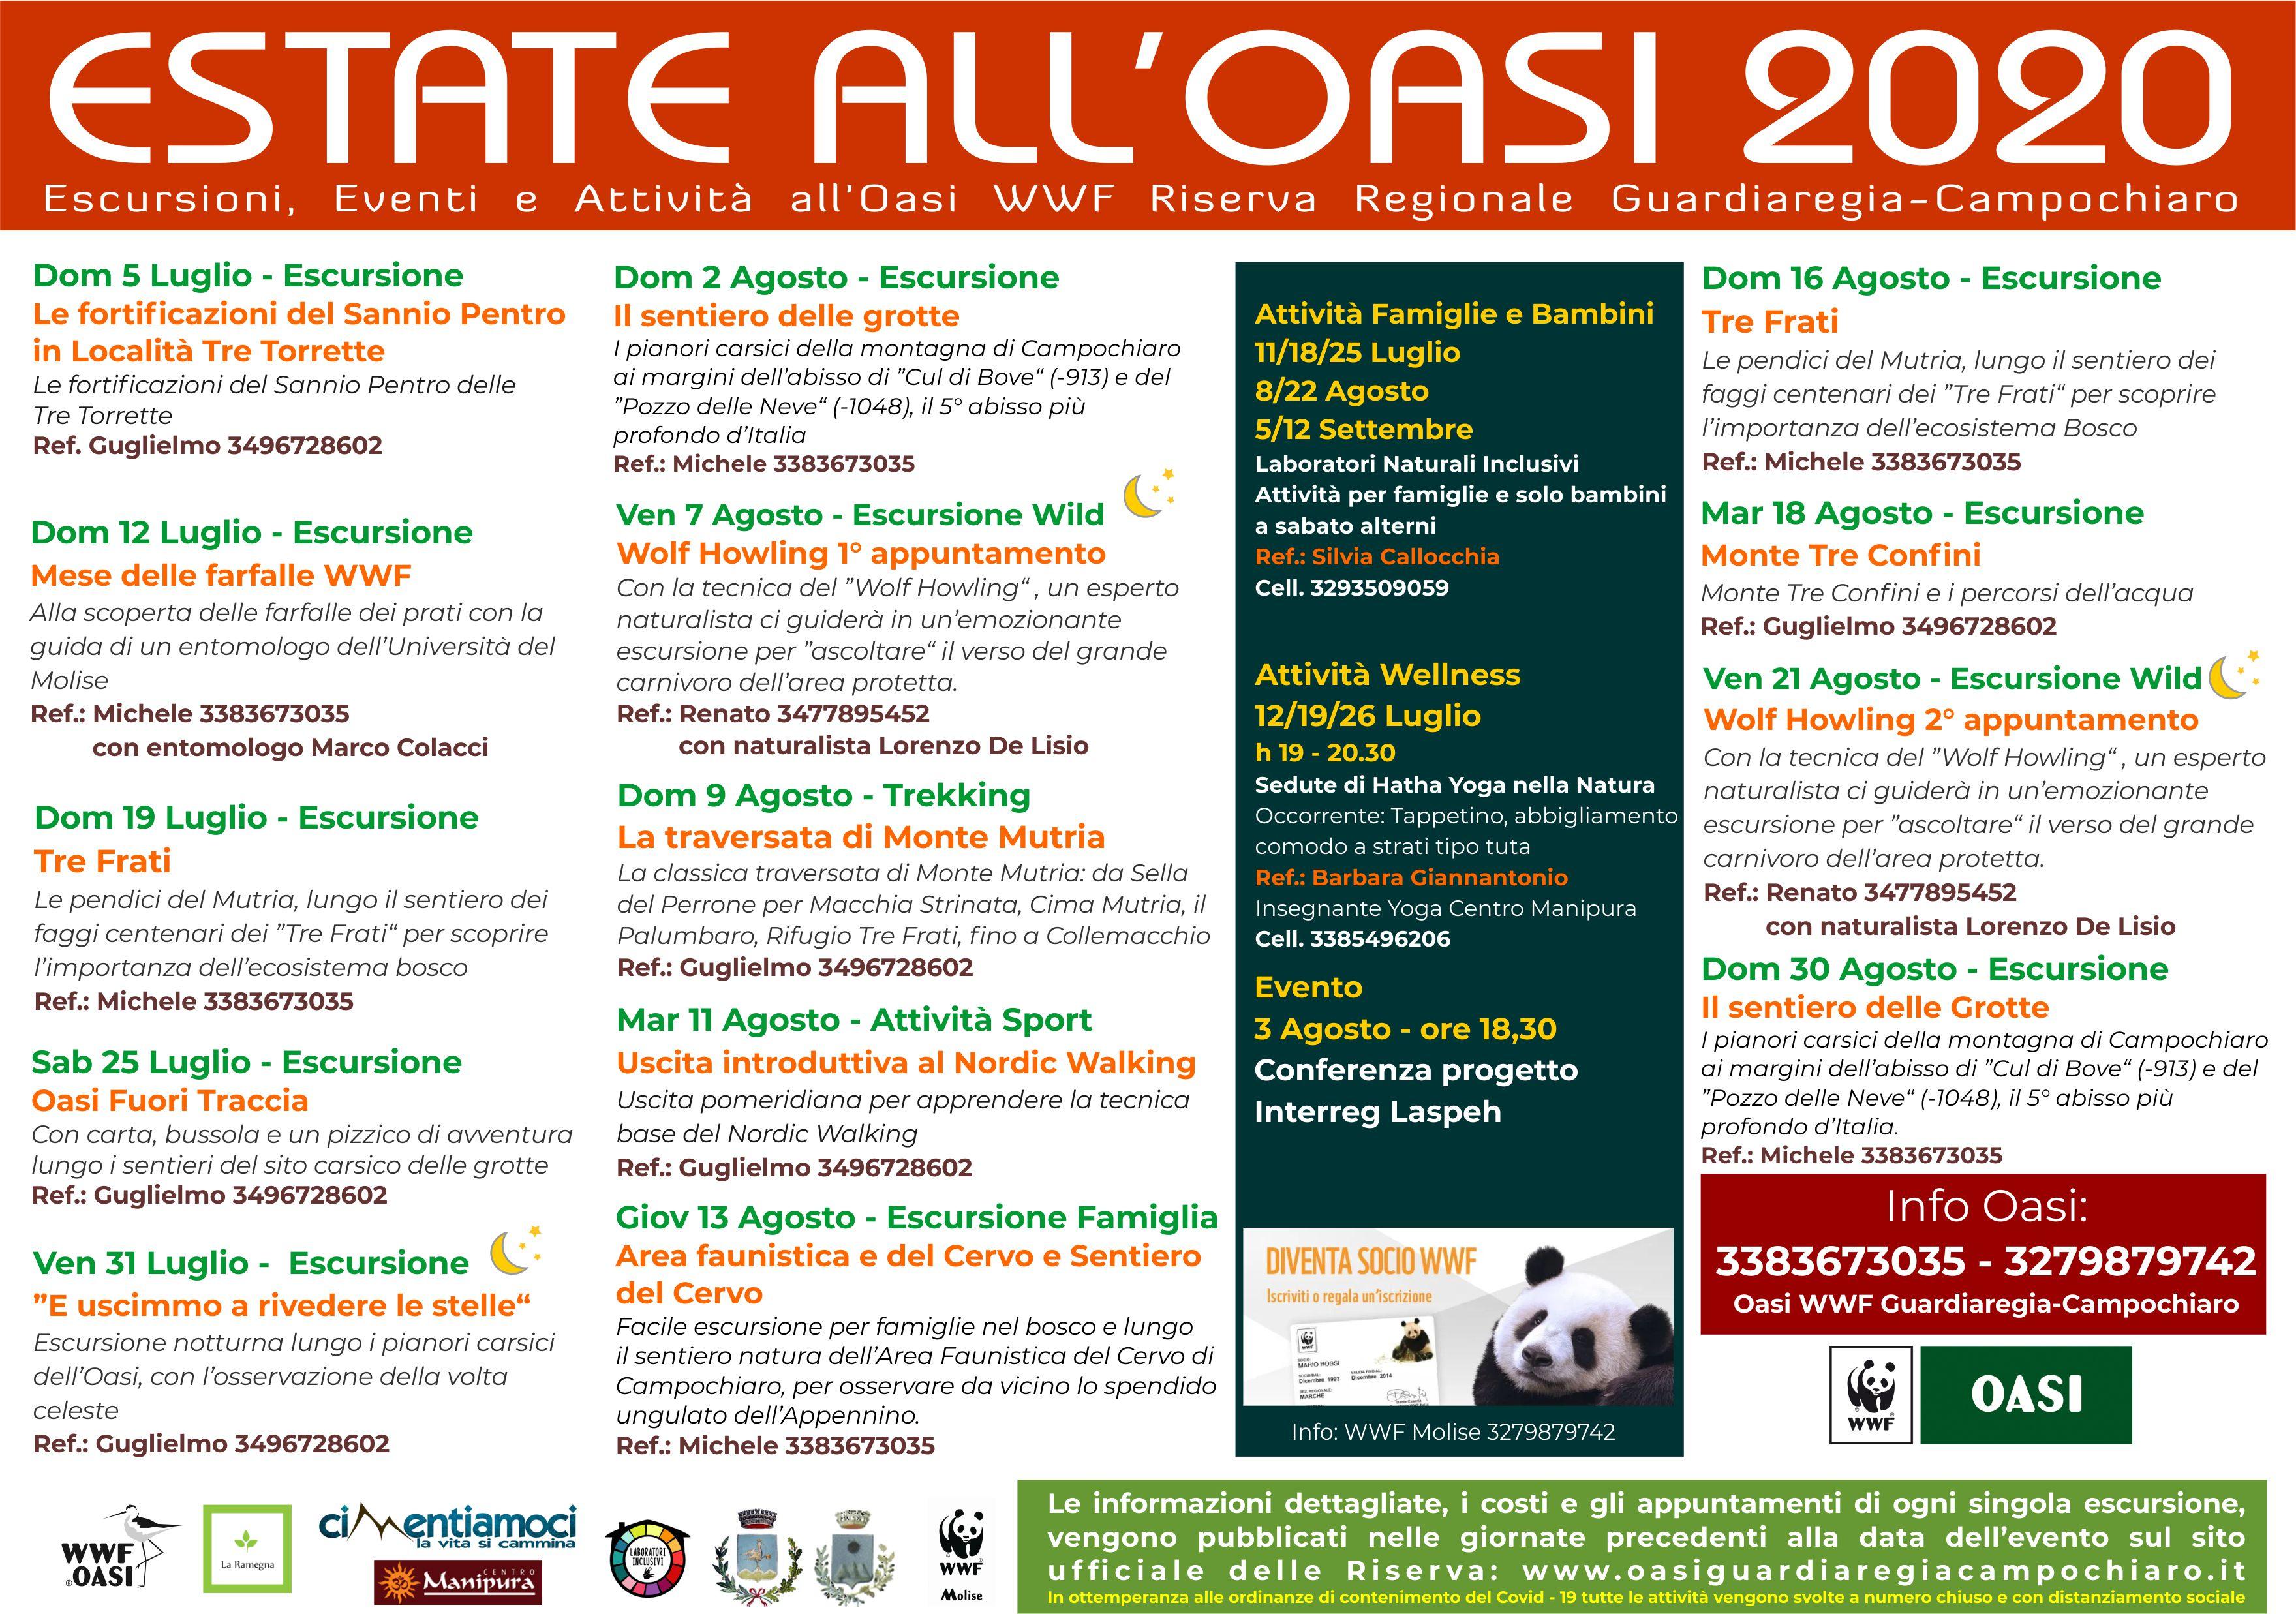 Calendario Estate all'Oasi 2020